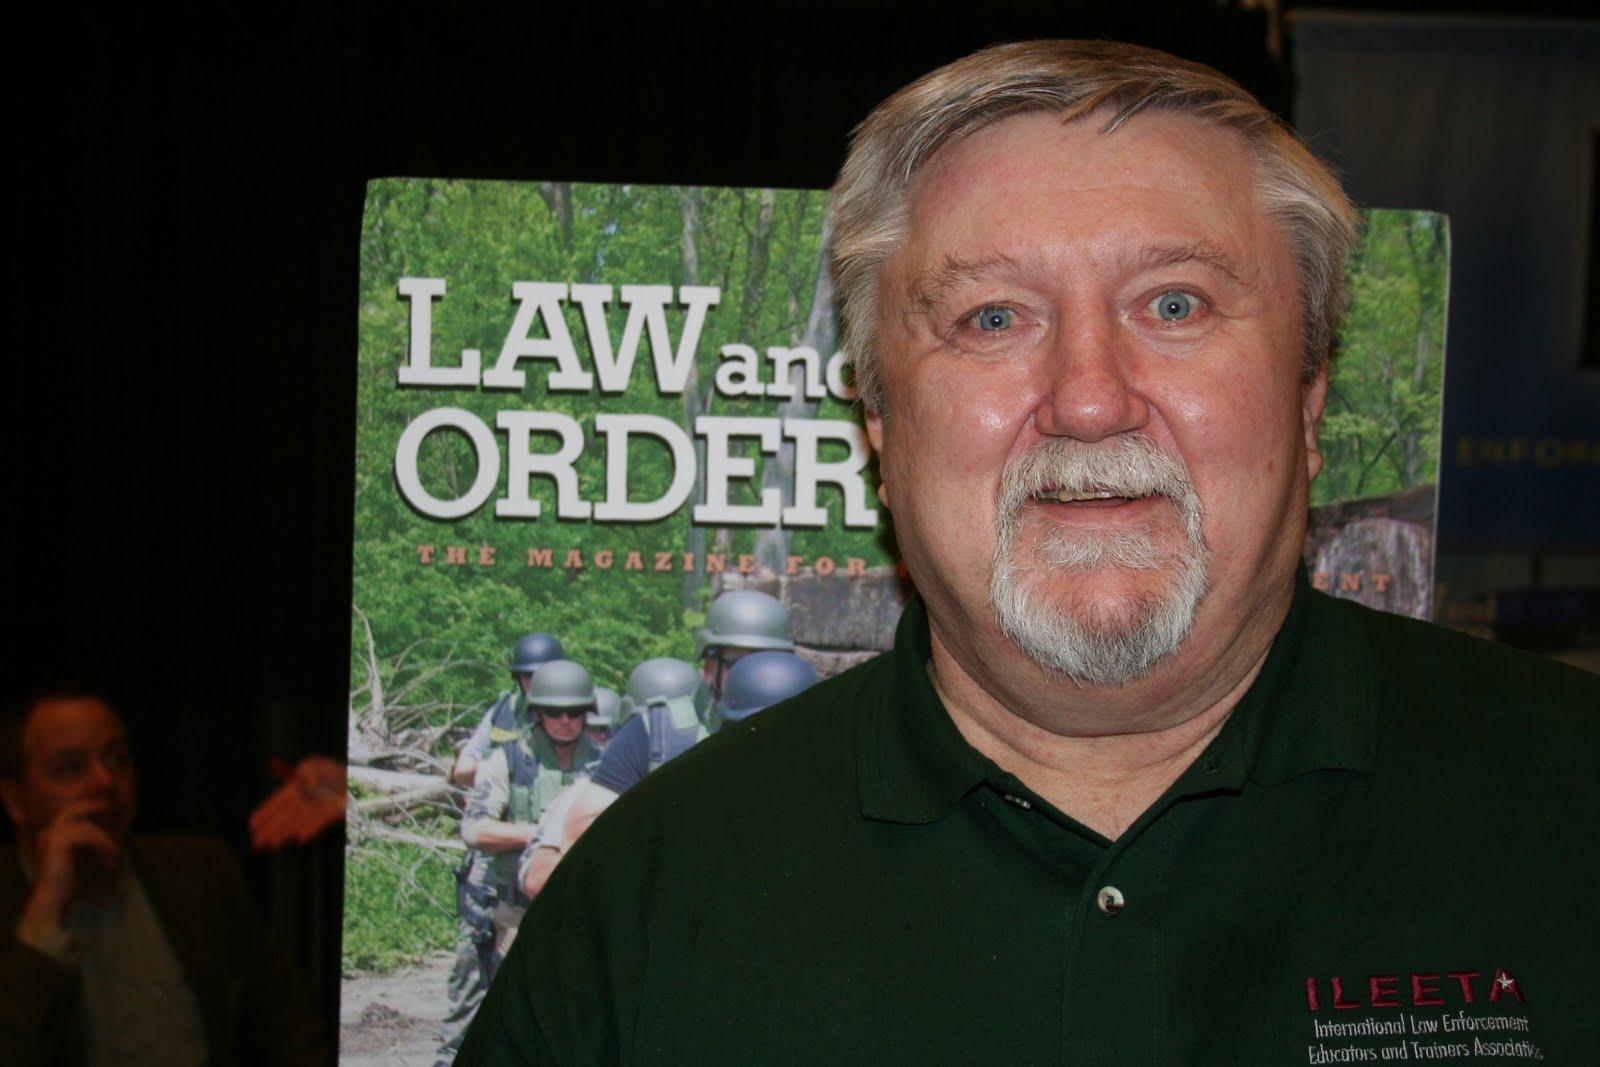 Meet Ed Nowicki, new member of PSWA